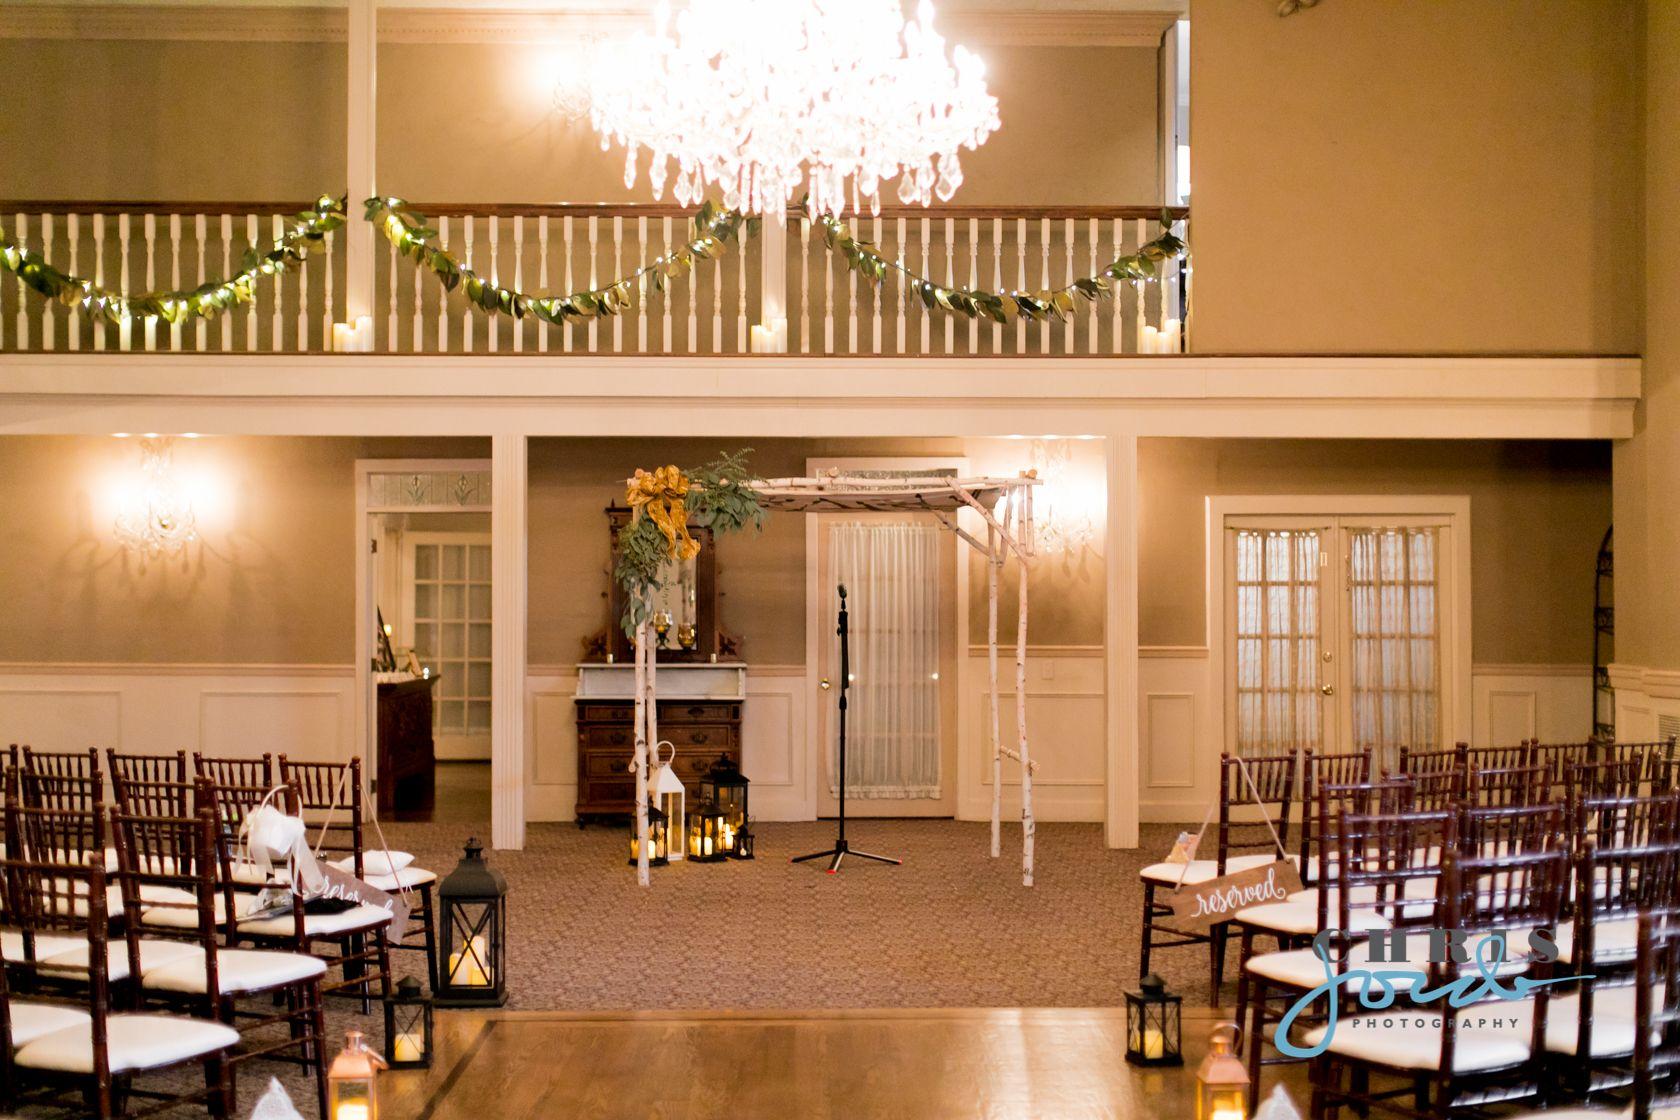 David S Country Inn Wedding Hackettstown New Jersey Country Inn Wedding Photography